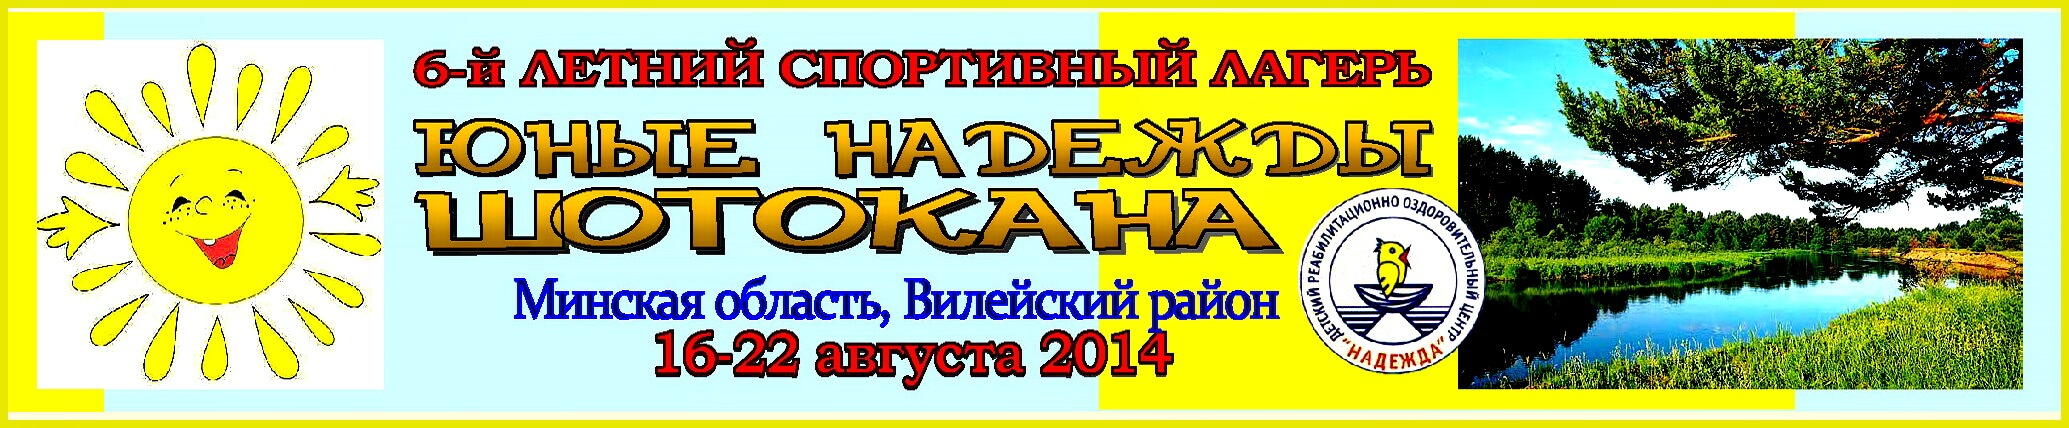 Надежда 08-2014 Баннер